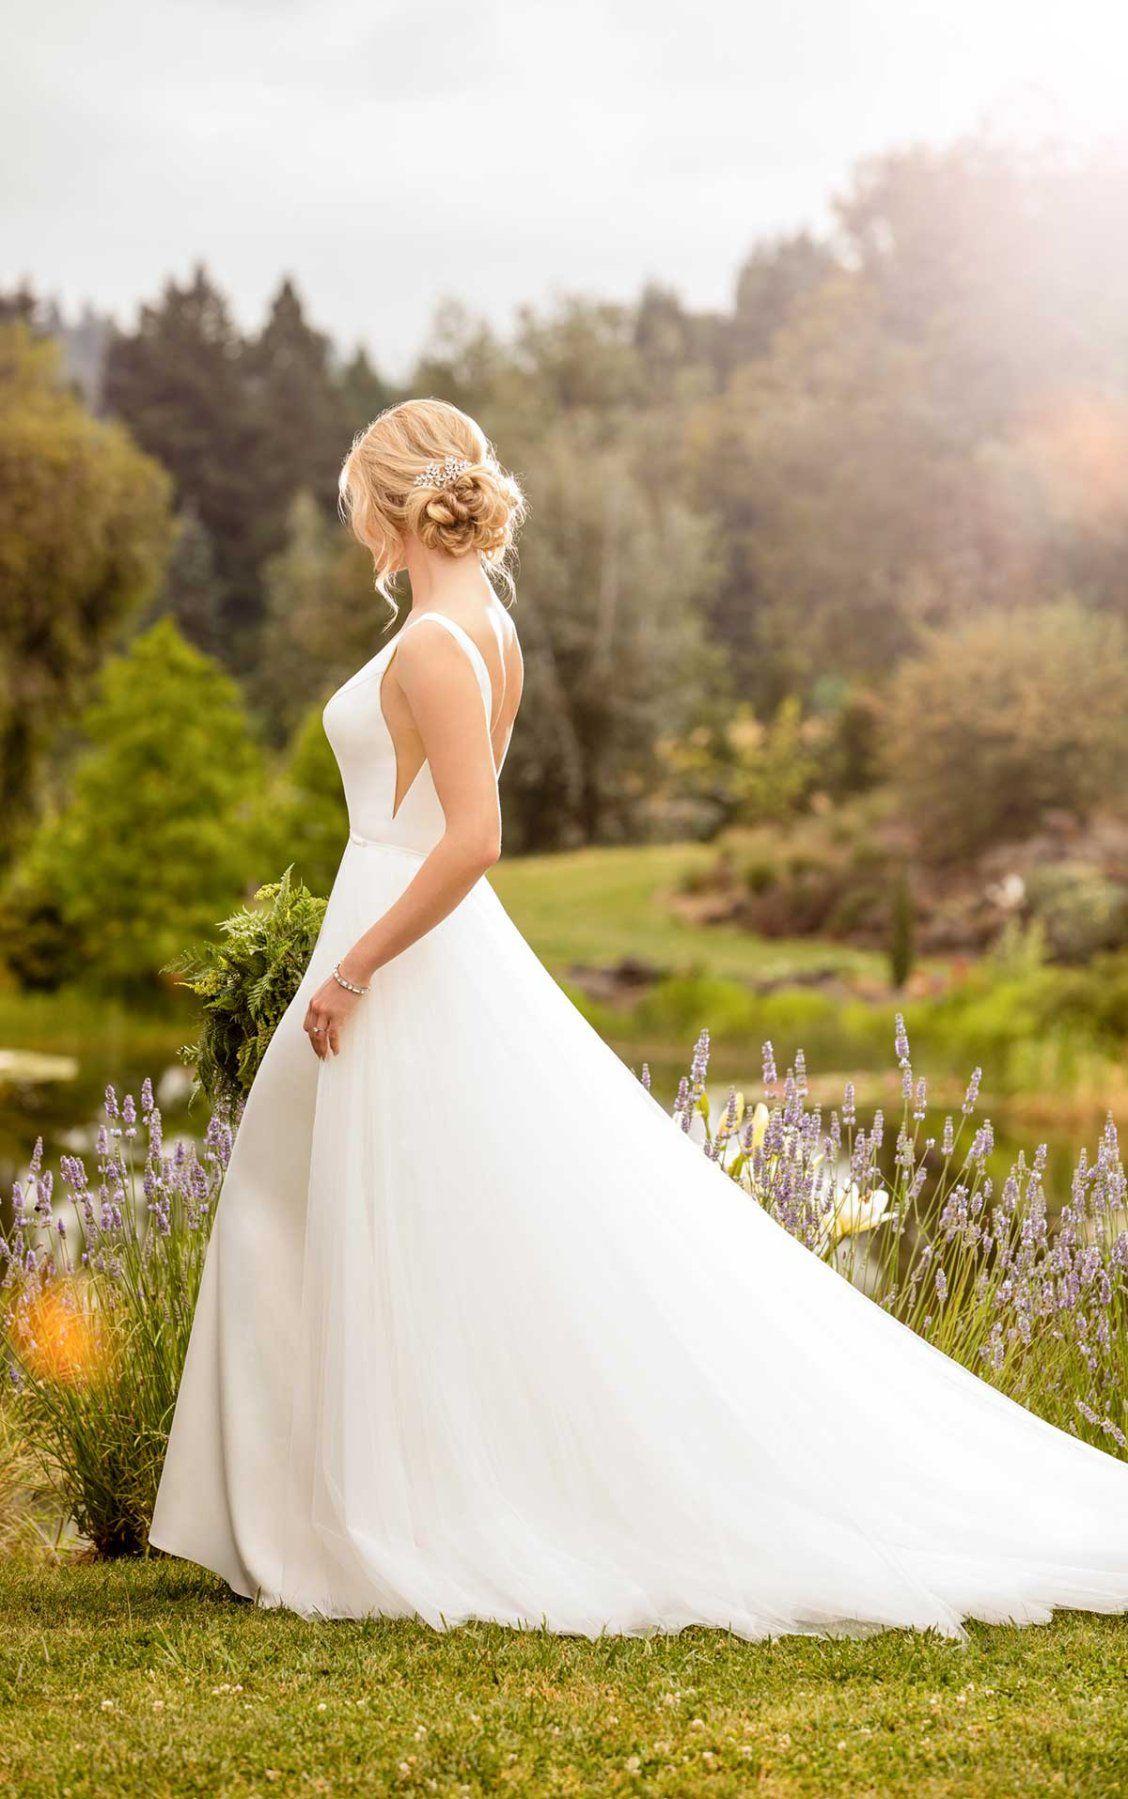 Classicly Simple Wedding Dress Stylish Wedding Dresses Essense Of Australia Wedding Dresses Wedding Dresses [ 1799 x 1128 Pixel ]